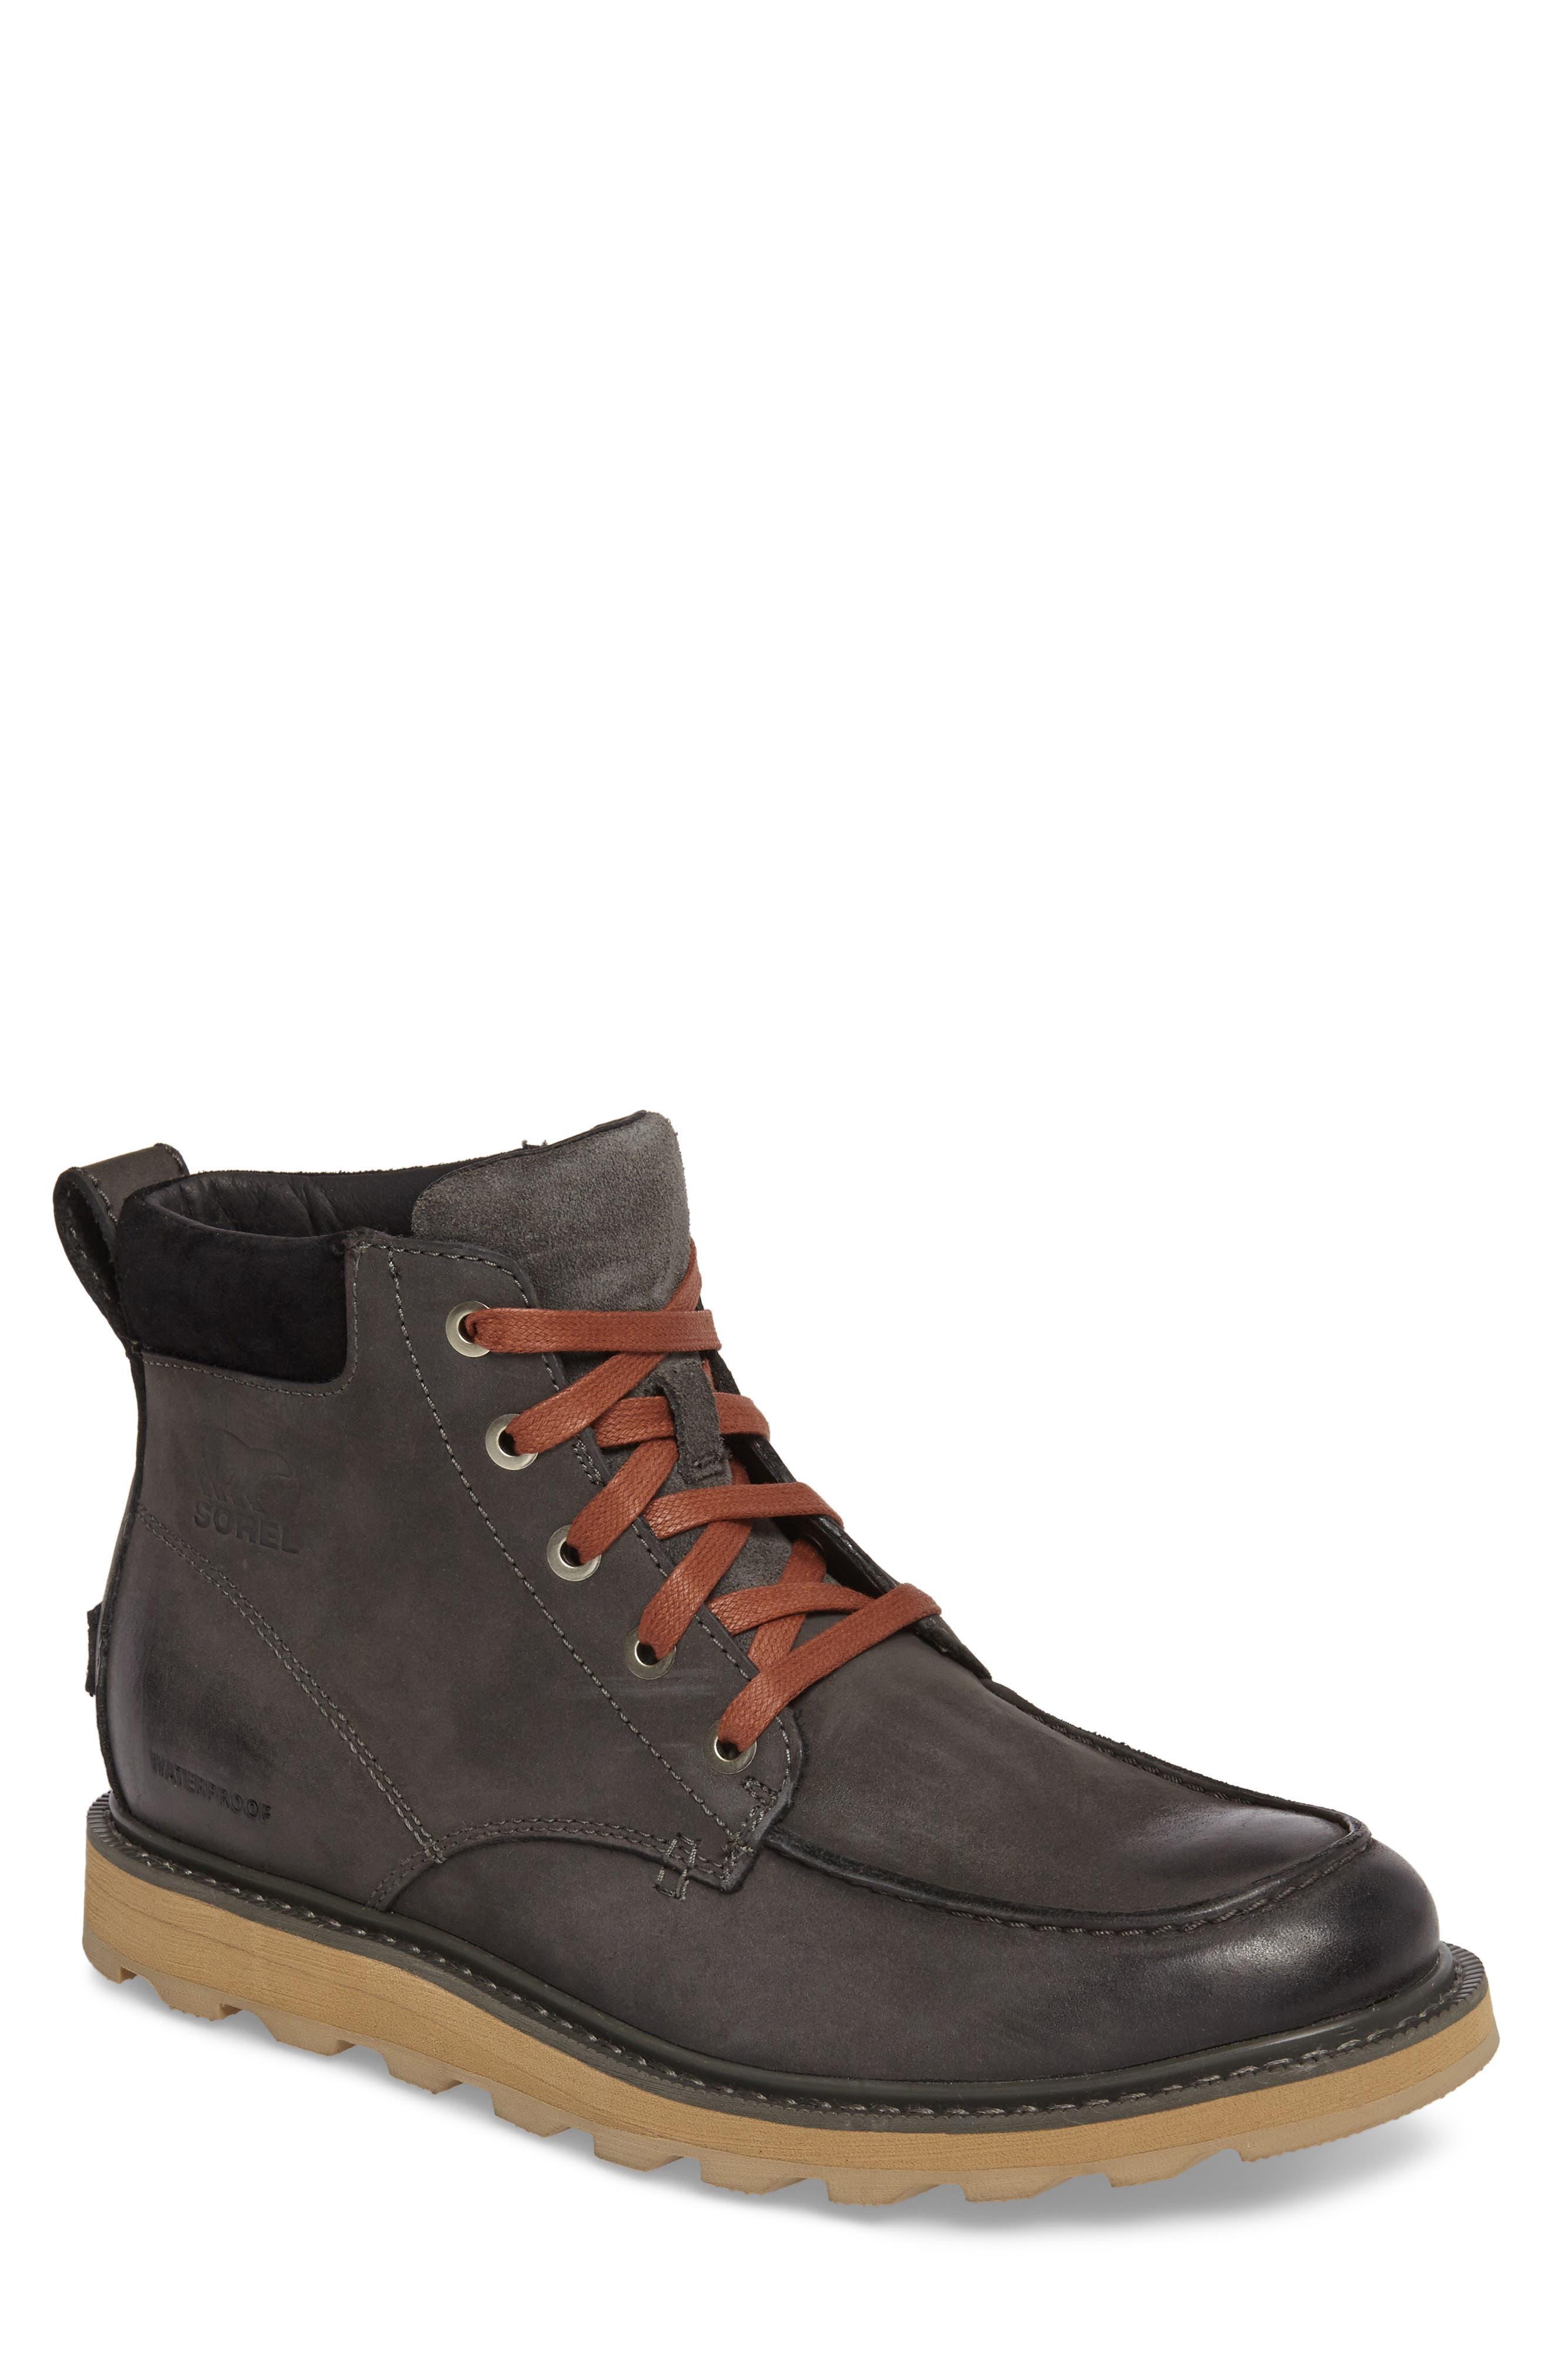 Sorel Madson Moc Toe Waterproof Boot- Grey